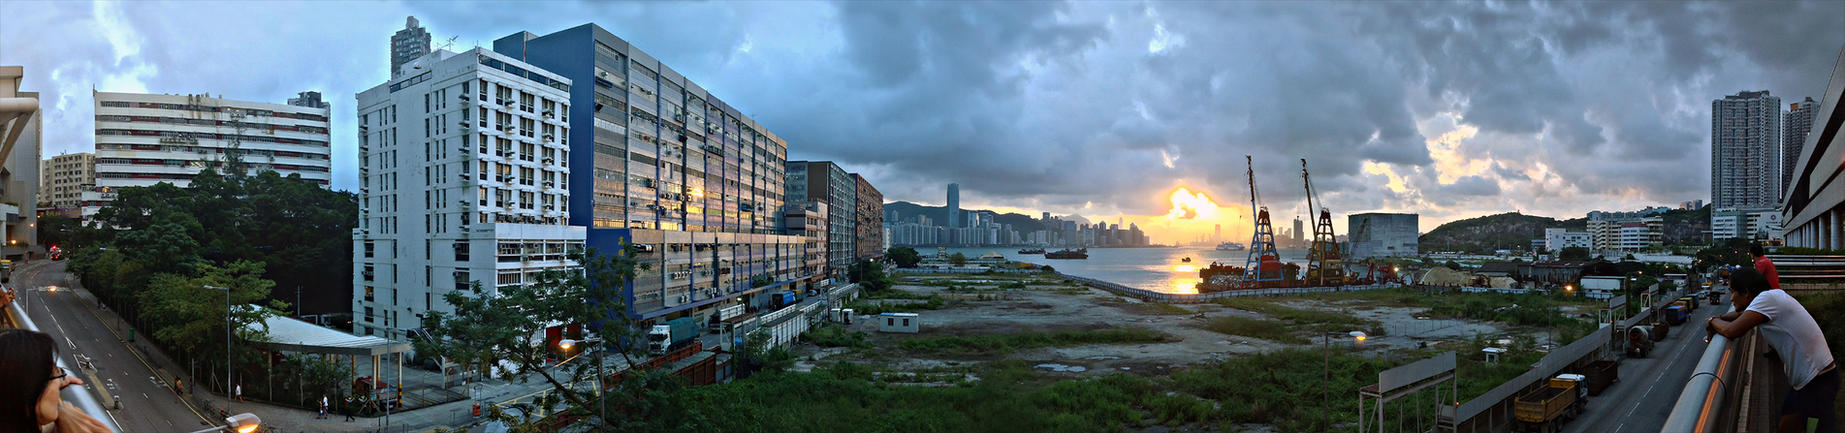 Panorama - Yau Tong (HDR) by Dystatic-Studio